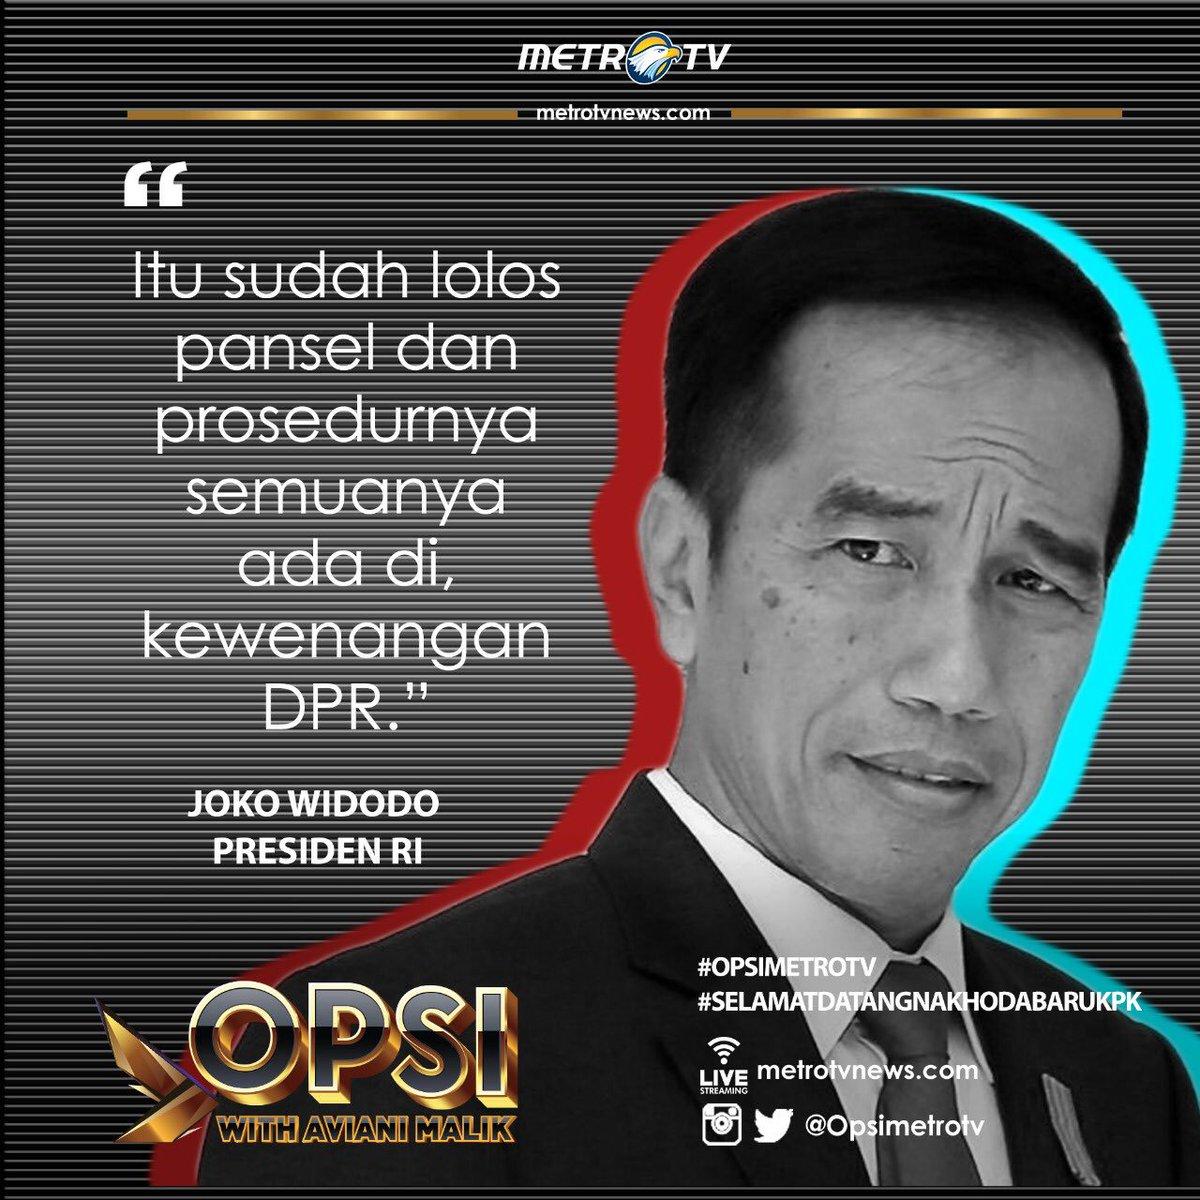 """Itu sudah lolos pansel dan prosedurnya semuanya ada di, kewenangan DPR."" - @jokowi, Presiden RI.Tunggu pembahasannya di #OPSIMetroTV #SelamatDatangNakhodaBaruKPK Senin (16/9) LIVE pkl 20.05 WIB di @Metro_TV.#kpk #savekpk #revisiuukpk @KPK_RI"